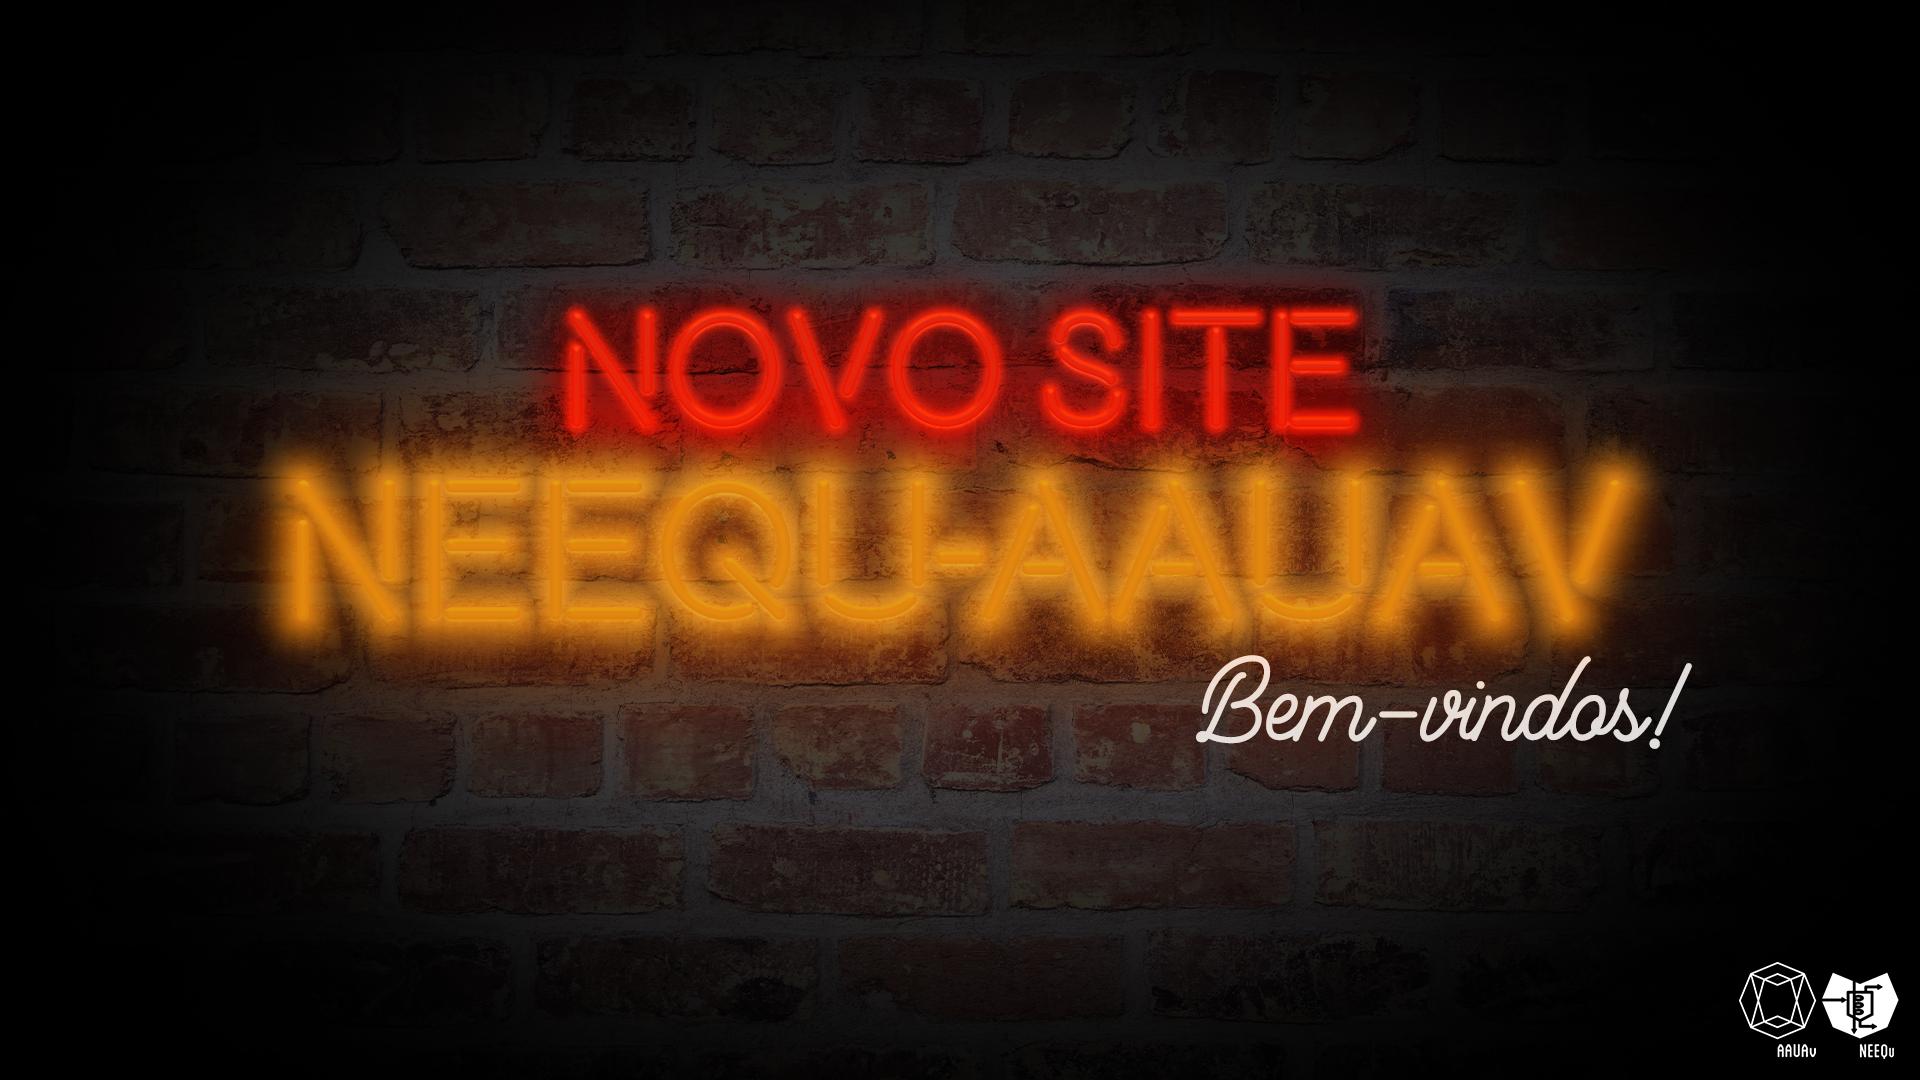 Novo Website NEEQu-AAUAv